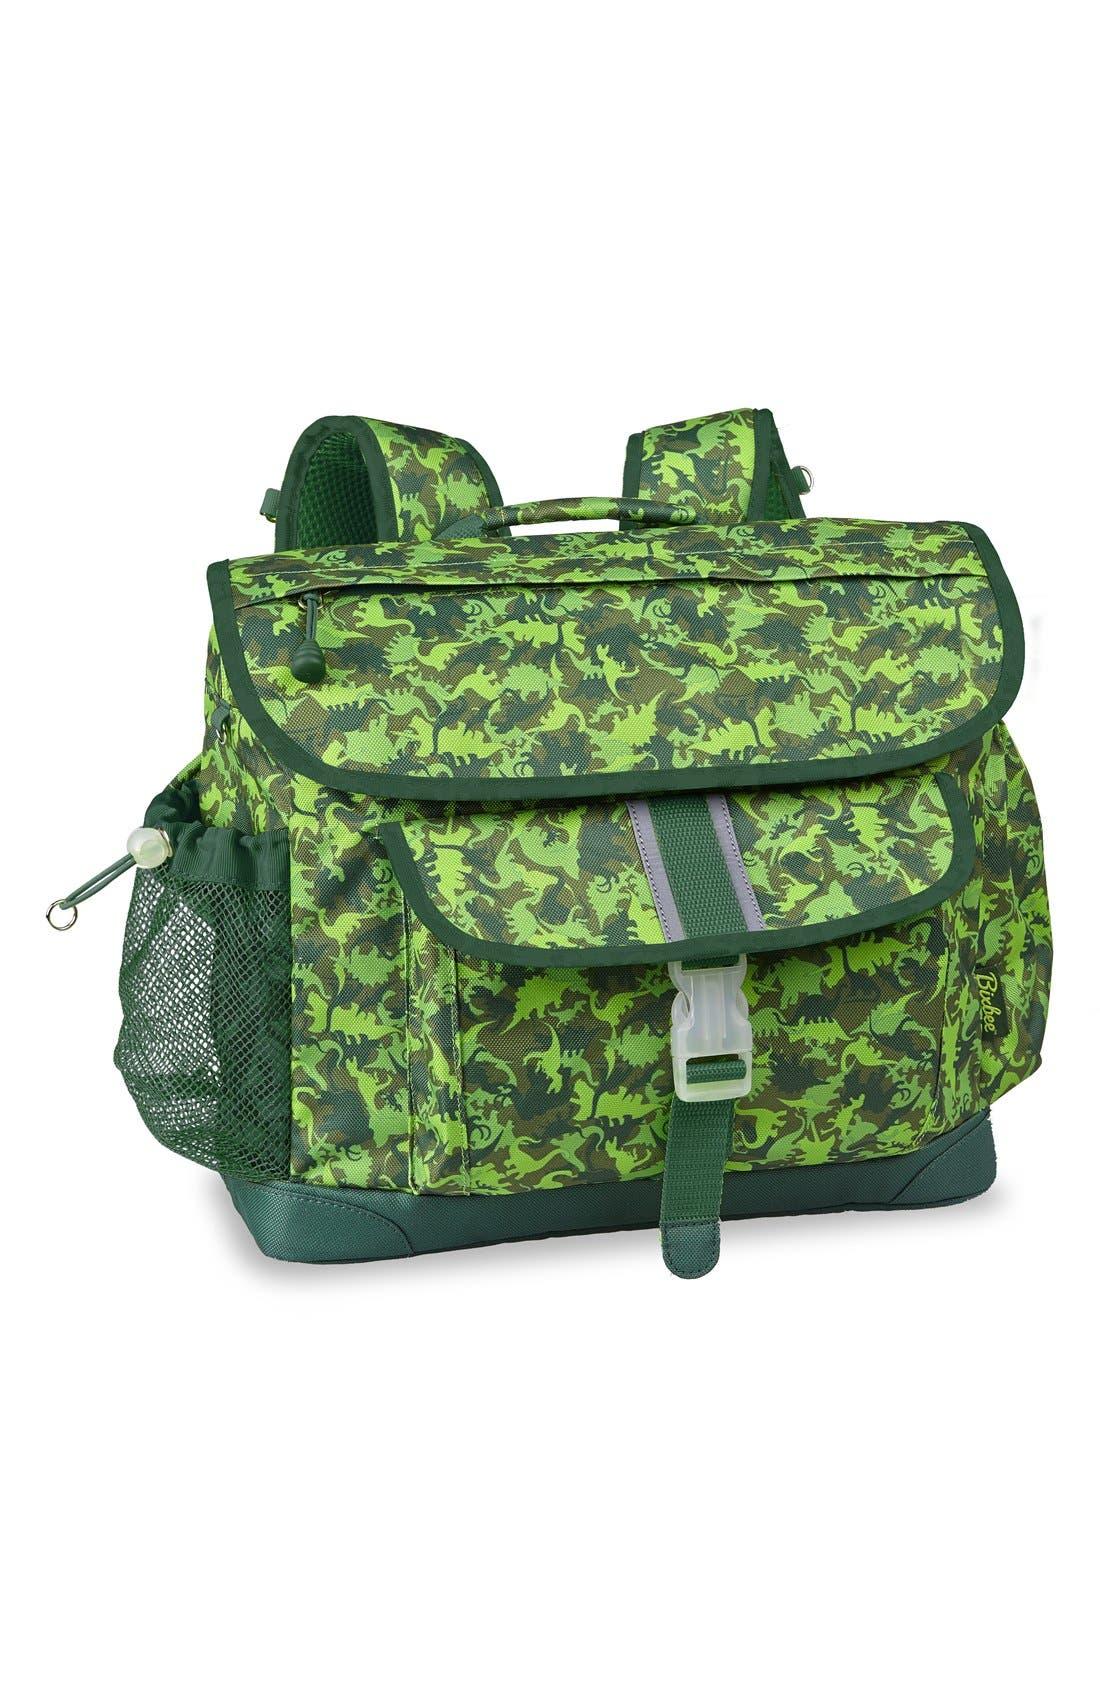 BIXBEE 'Large Dino Camo' Water Resistant Backpack